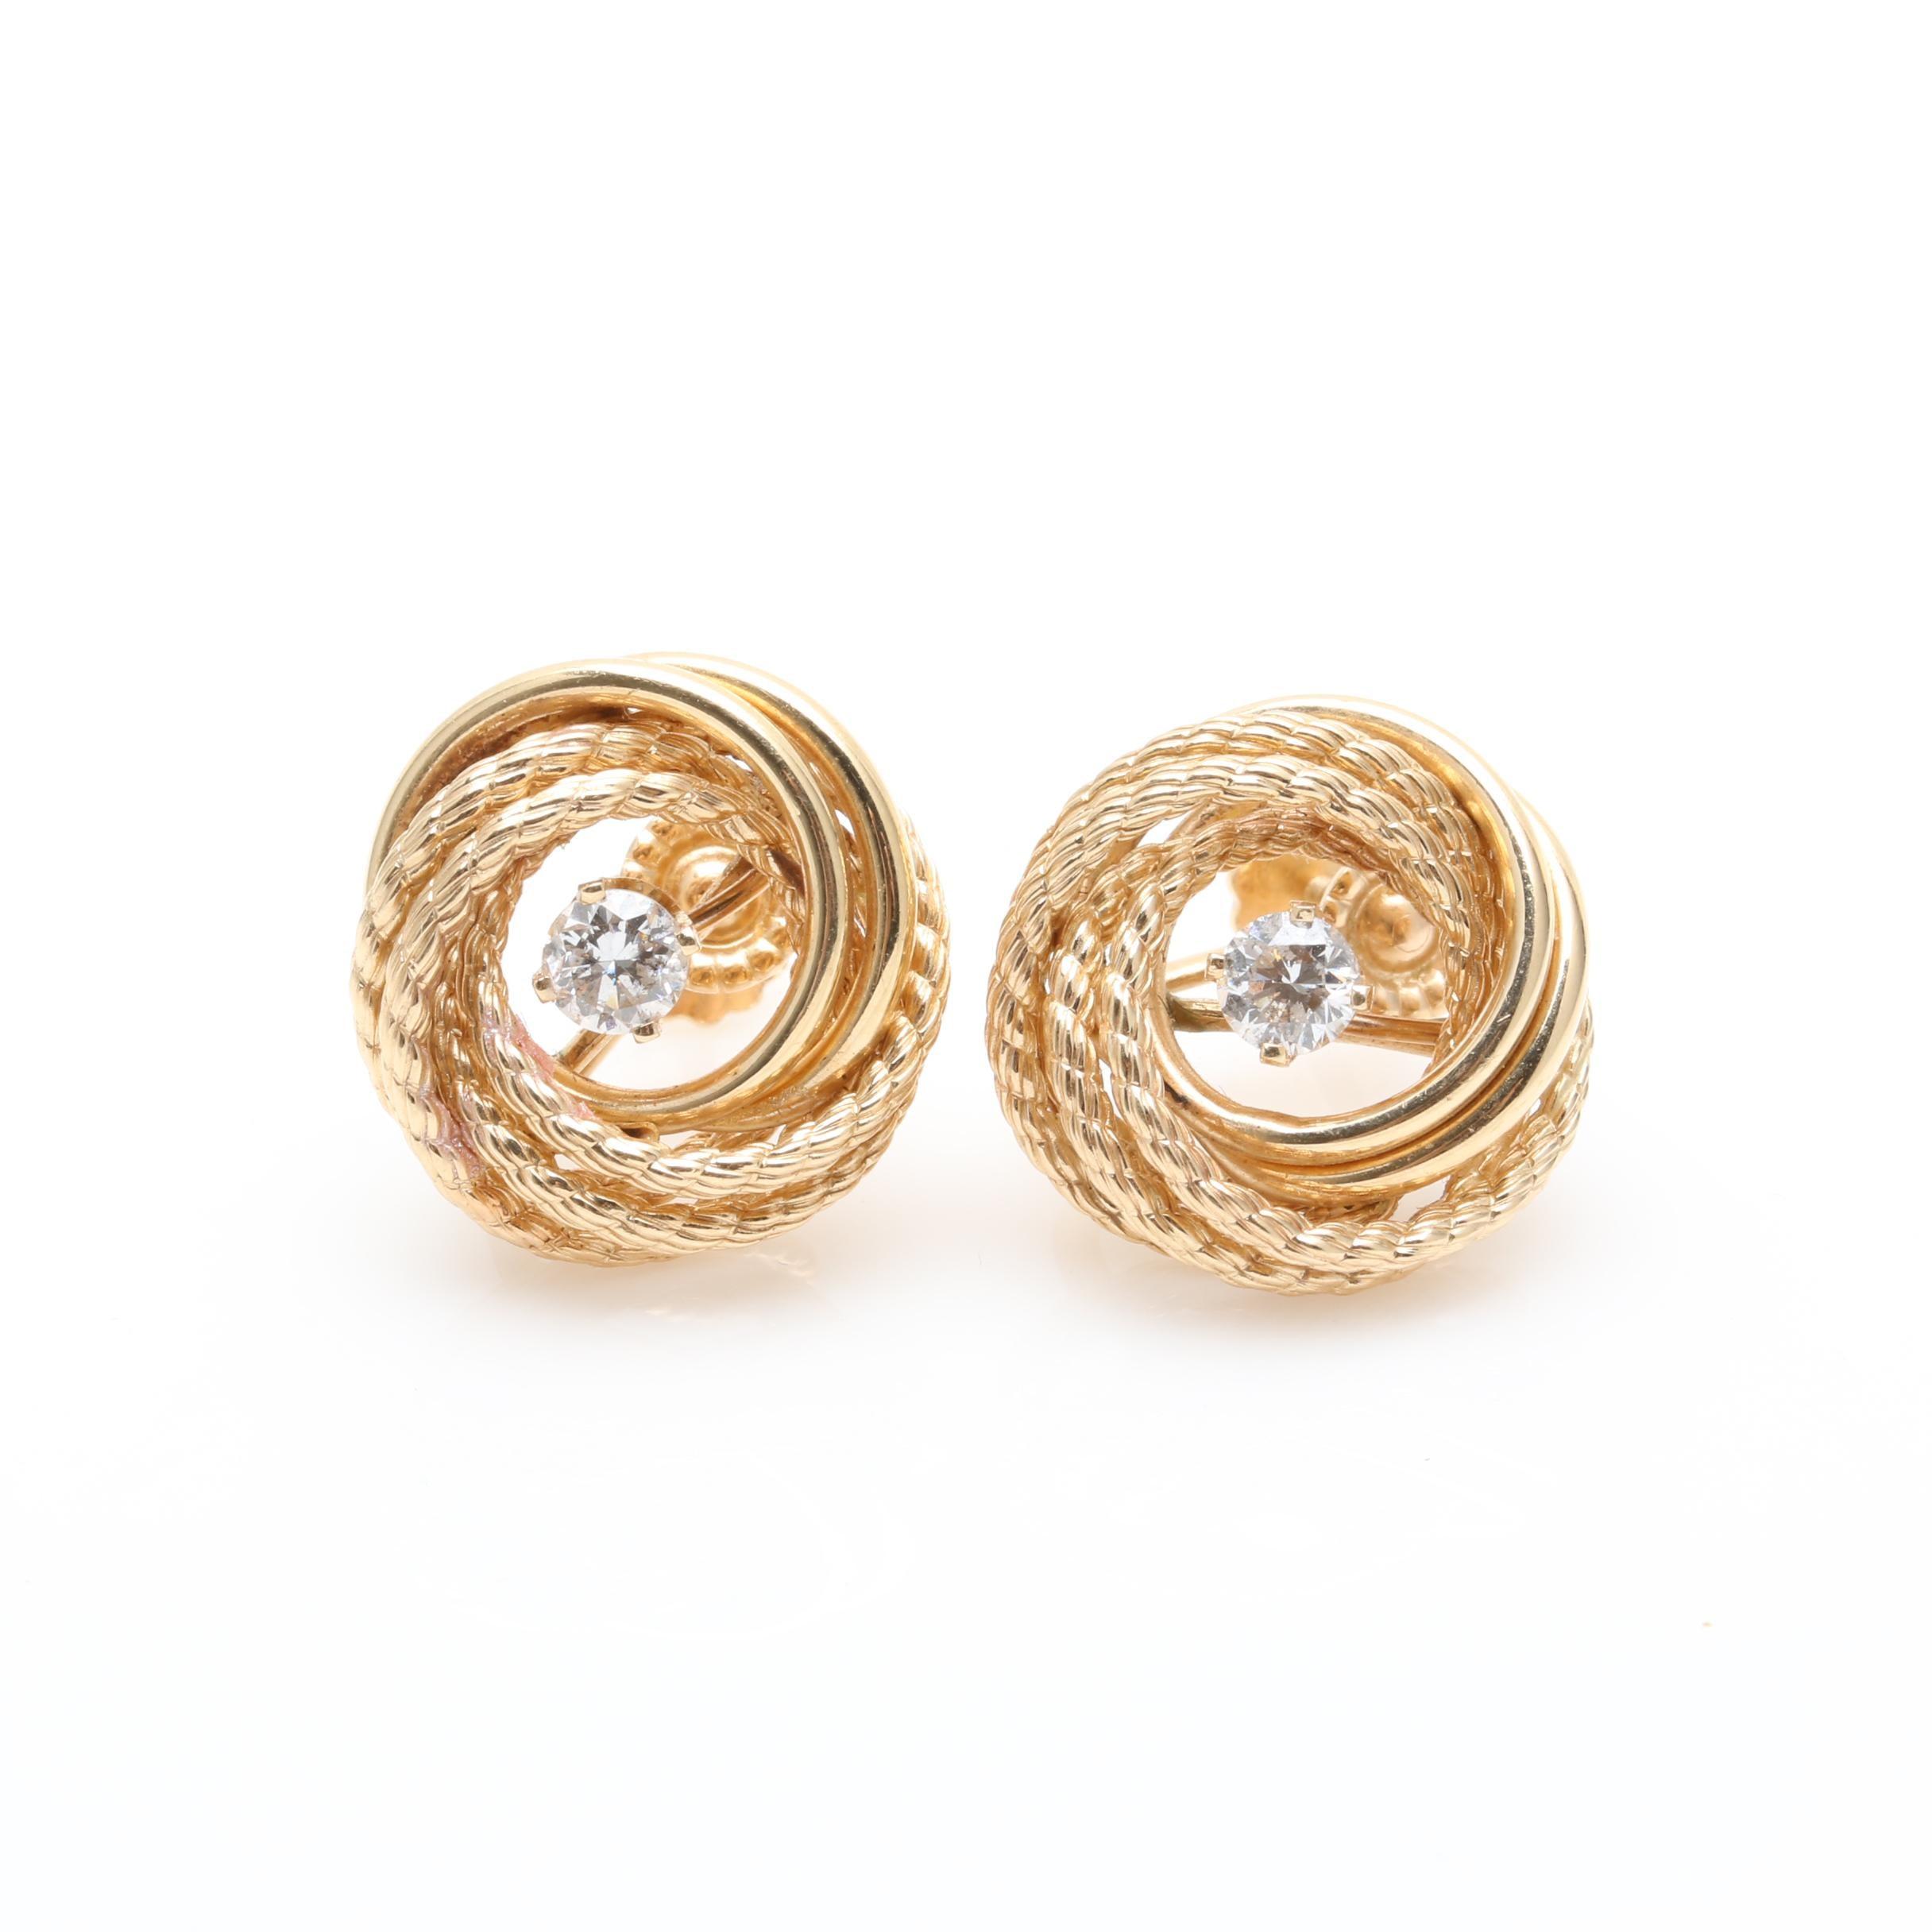 14K Yellow Gold Diamond Textured Love Knot Earrings